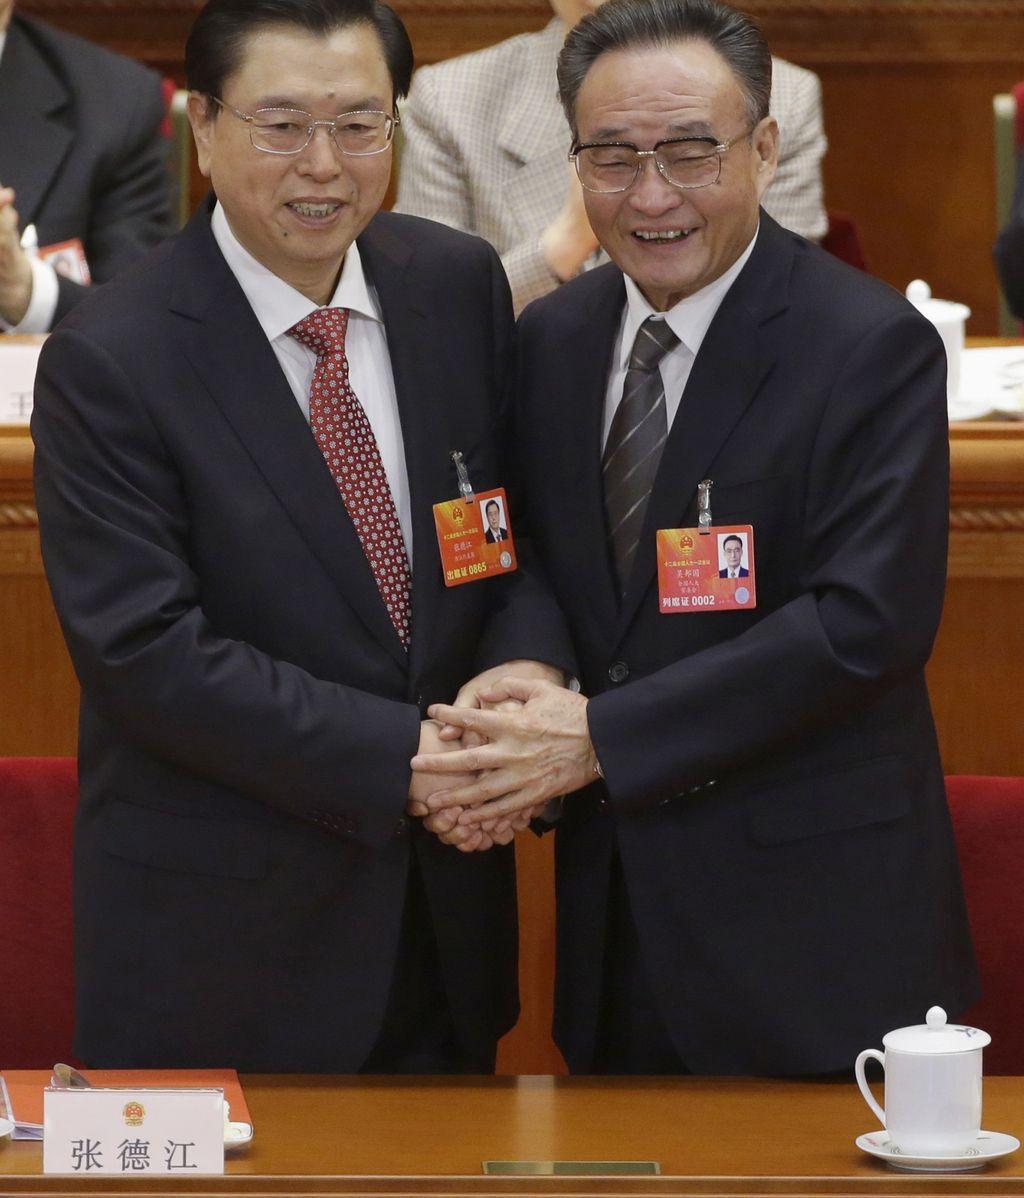 Xi Jinping, elegido formalmente como presidente de China